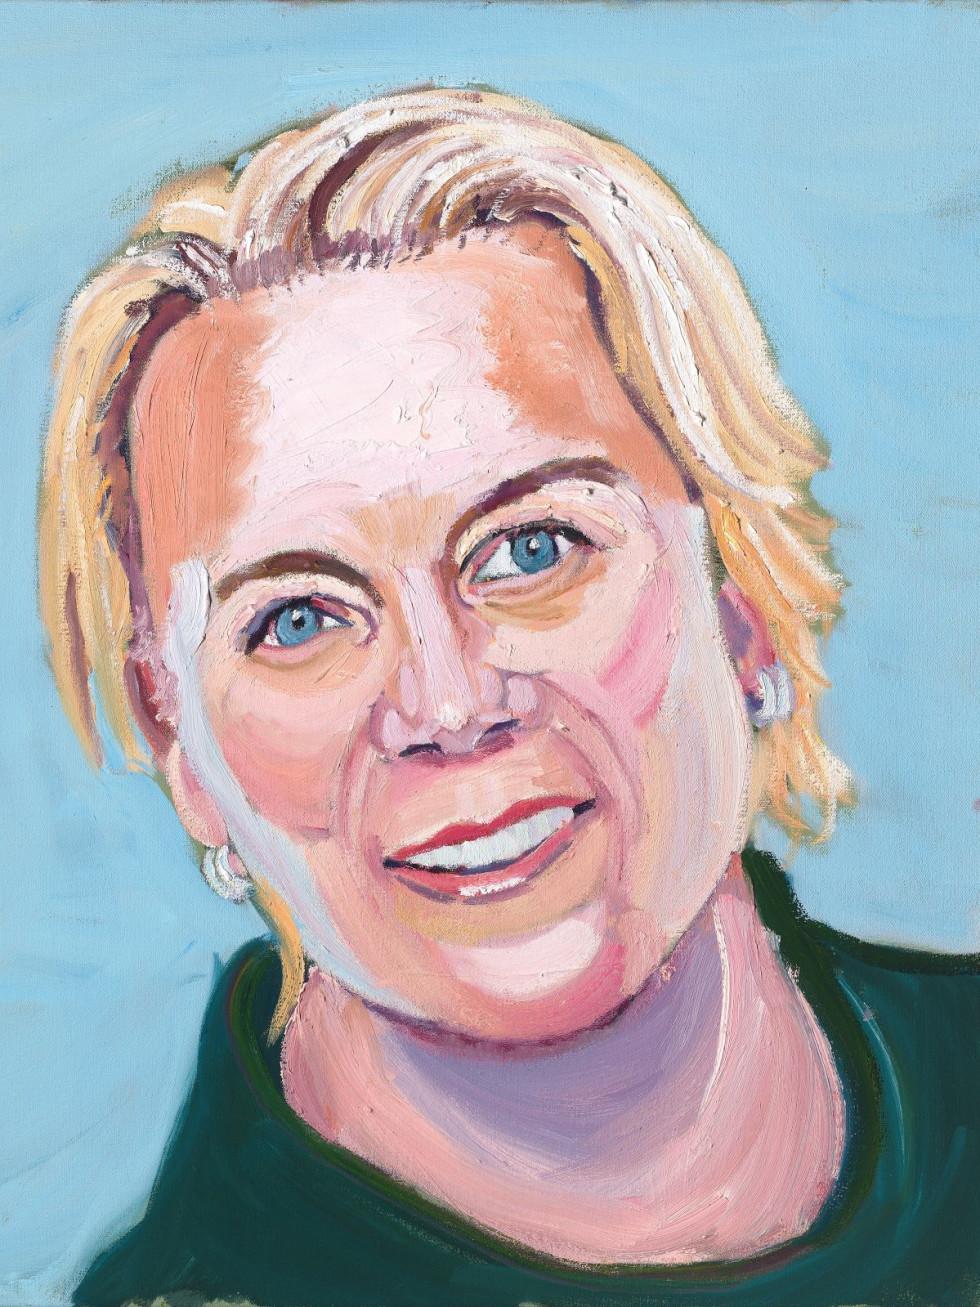 Annika Sorenstam portrait by George W. Bush